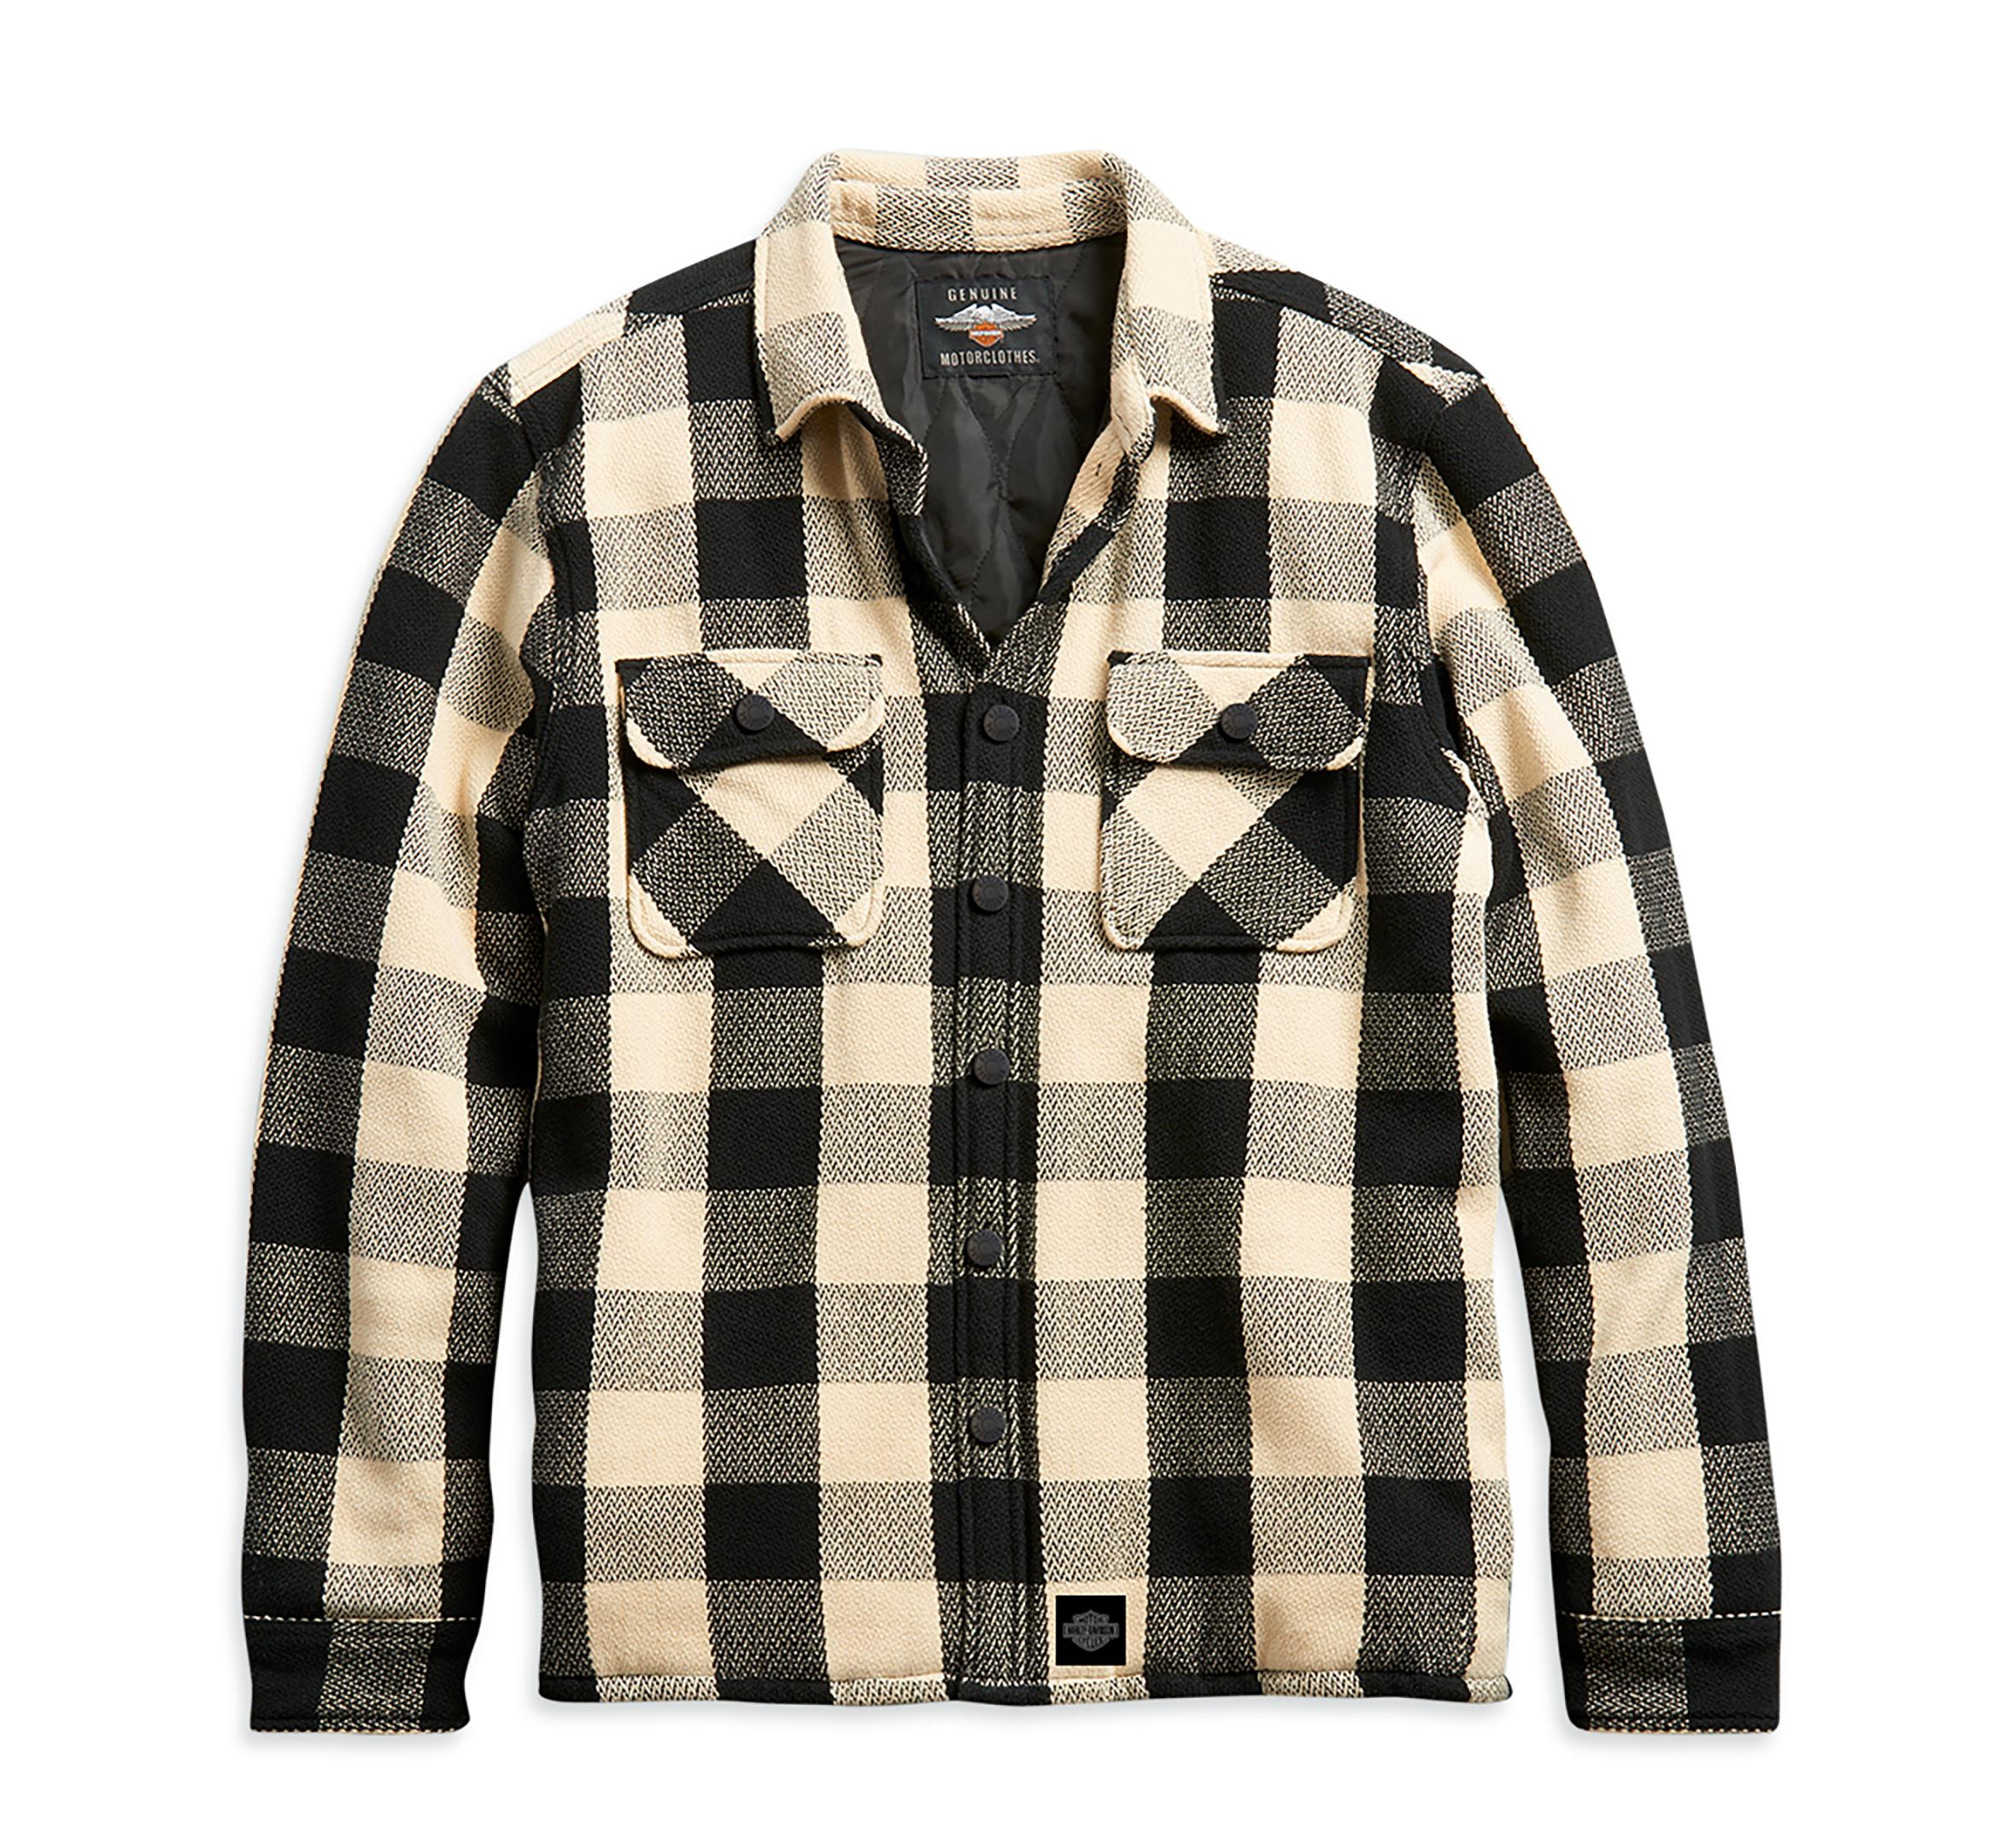 Harley Davidson Shirt-Woven Herren TAN PLAID Karohemd robust 96272-21VH